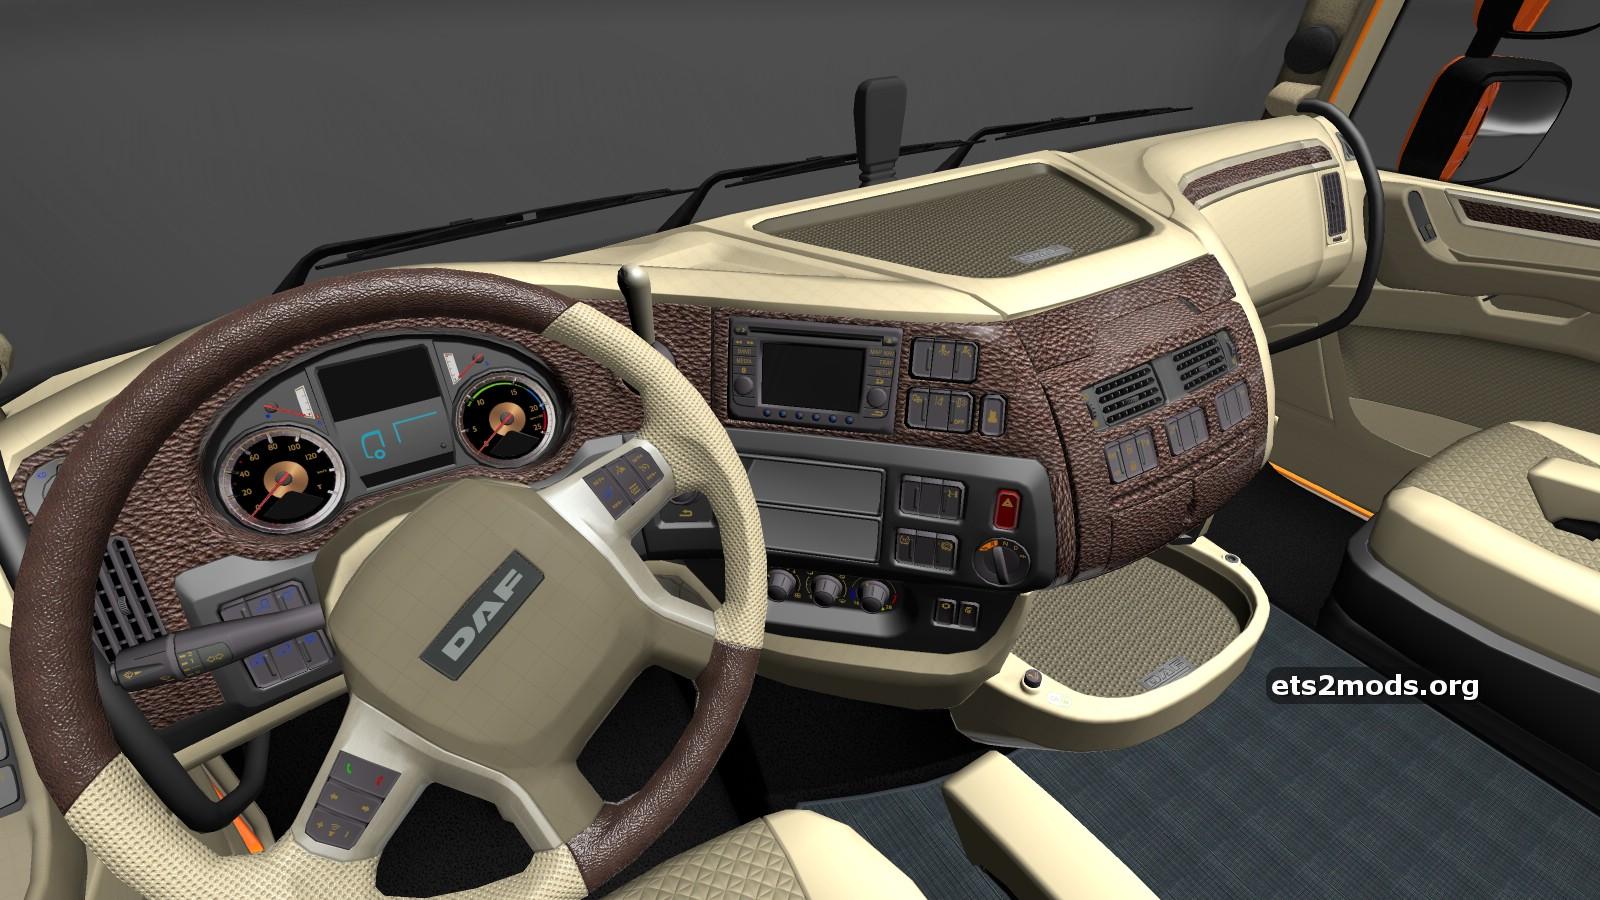 Daf euro 6 interior by zapenakpea ets2 mods for Daf euro 6 interieur